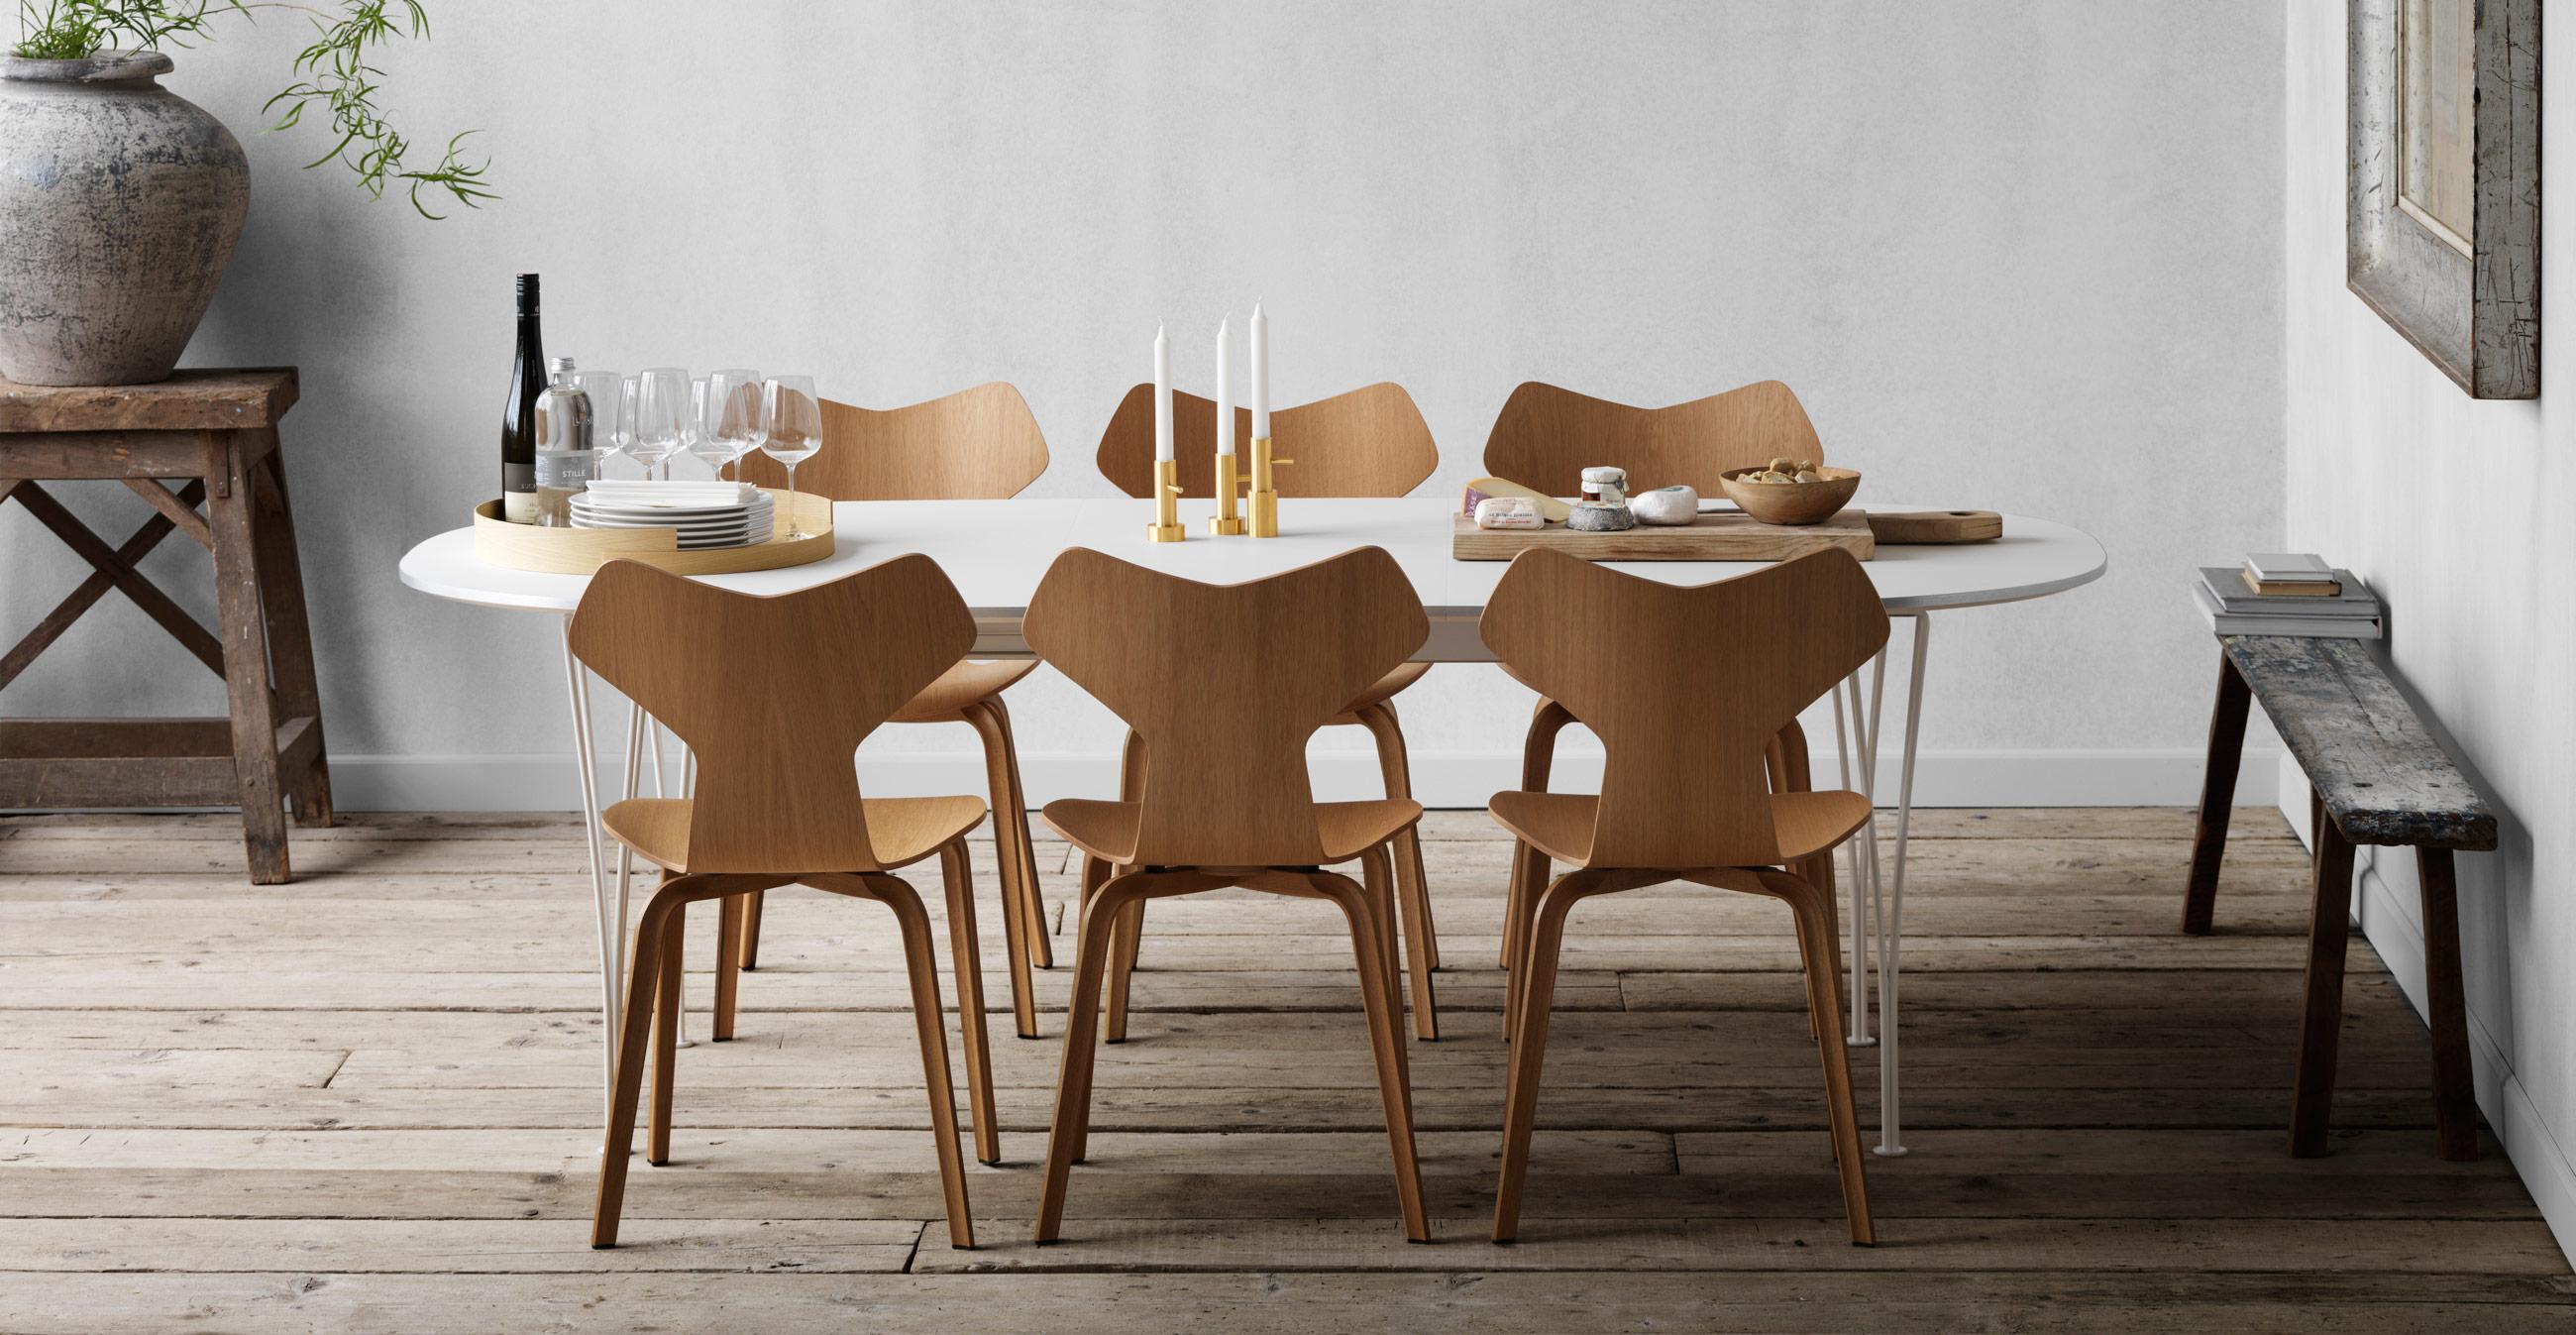 Fritz Hansen Super Elliptical Table White Laminate & White Base with Grand Prix Chairs